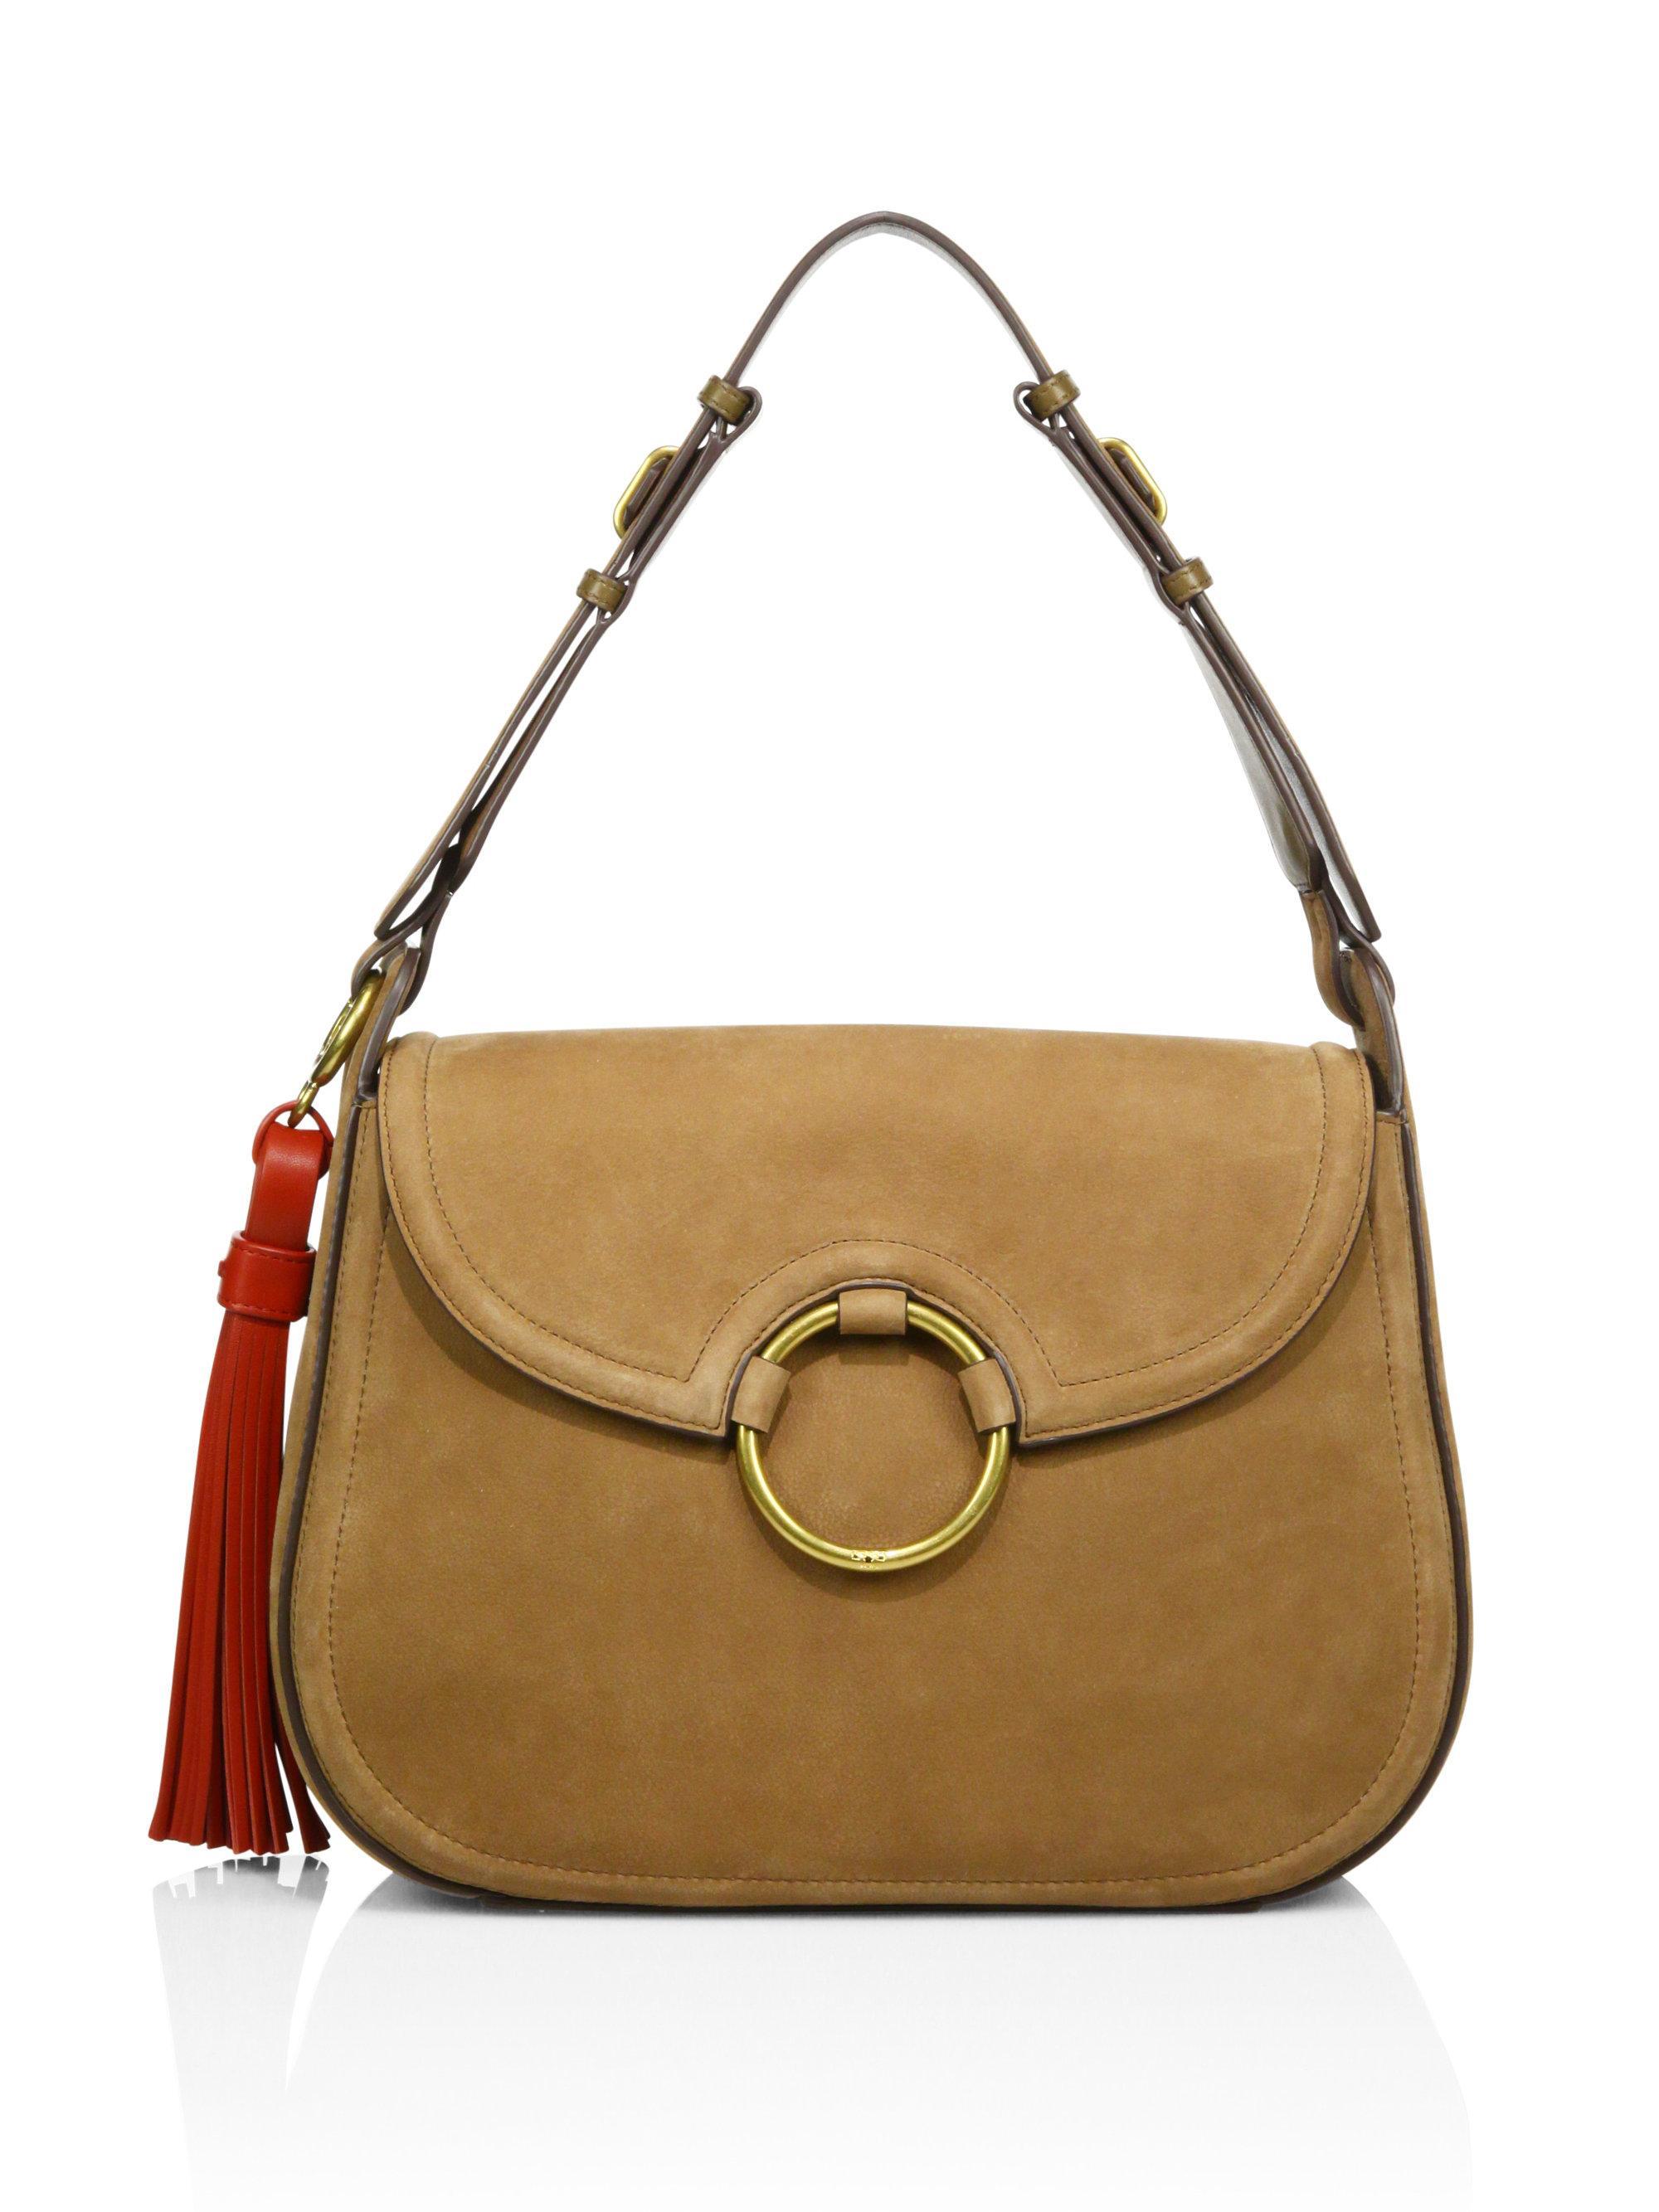 114d005a87031 ... cheap tory burch tassel suede large shoulder bag lyst 0ff2a 0b9df